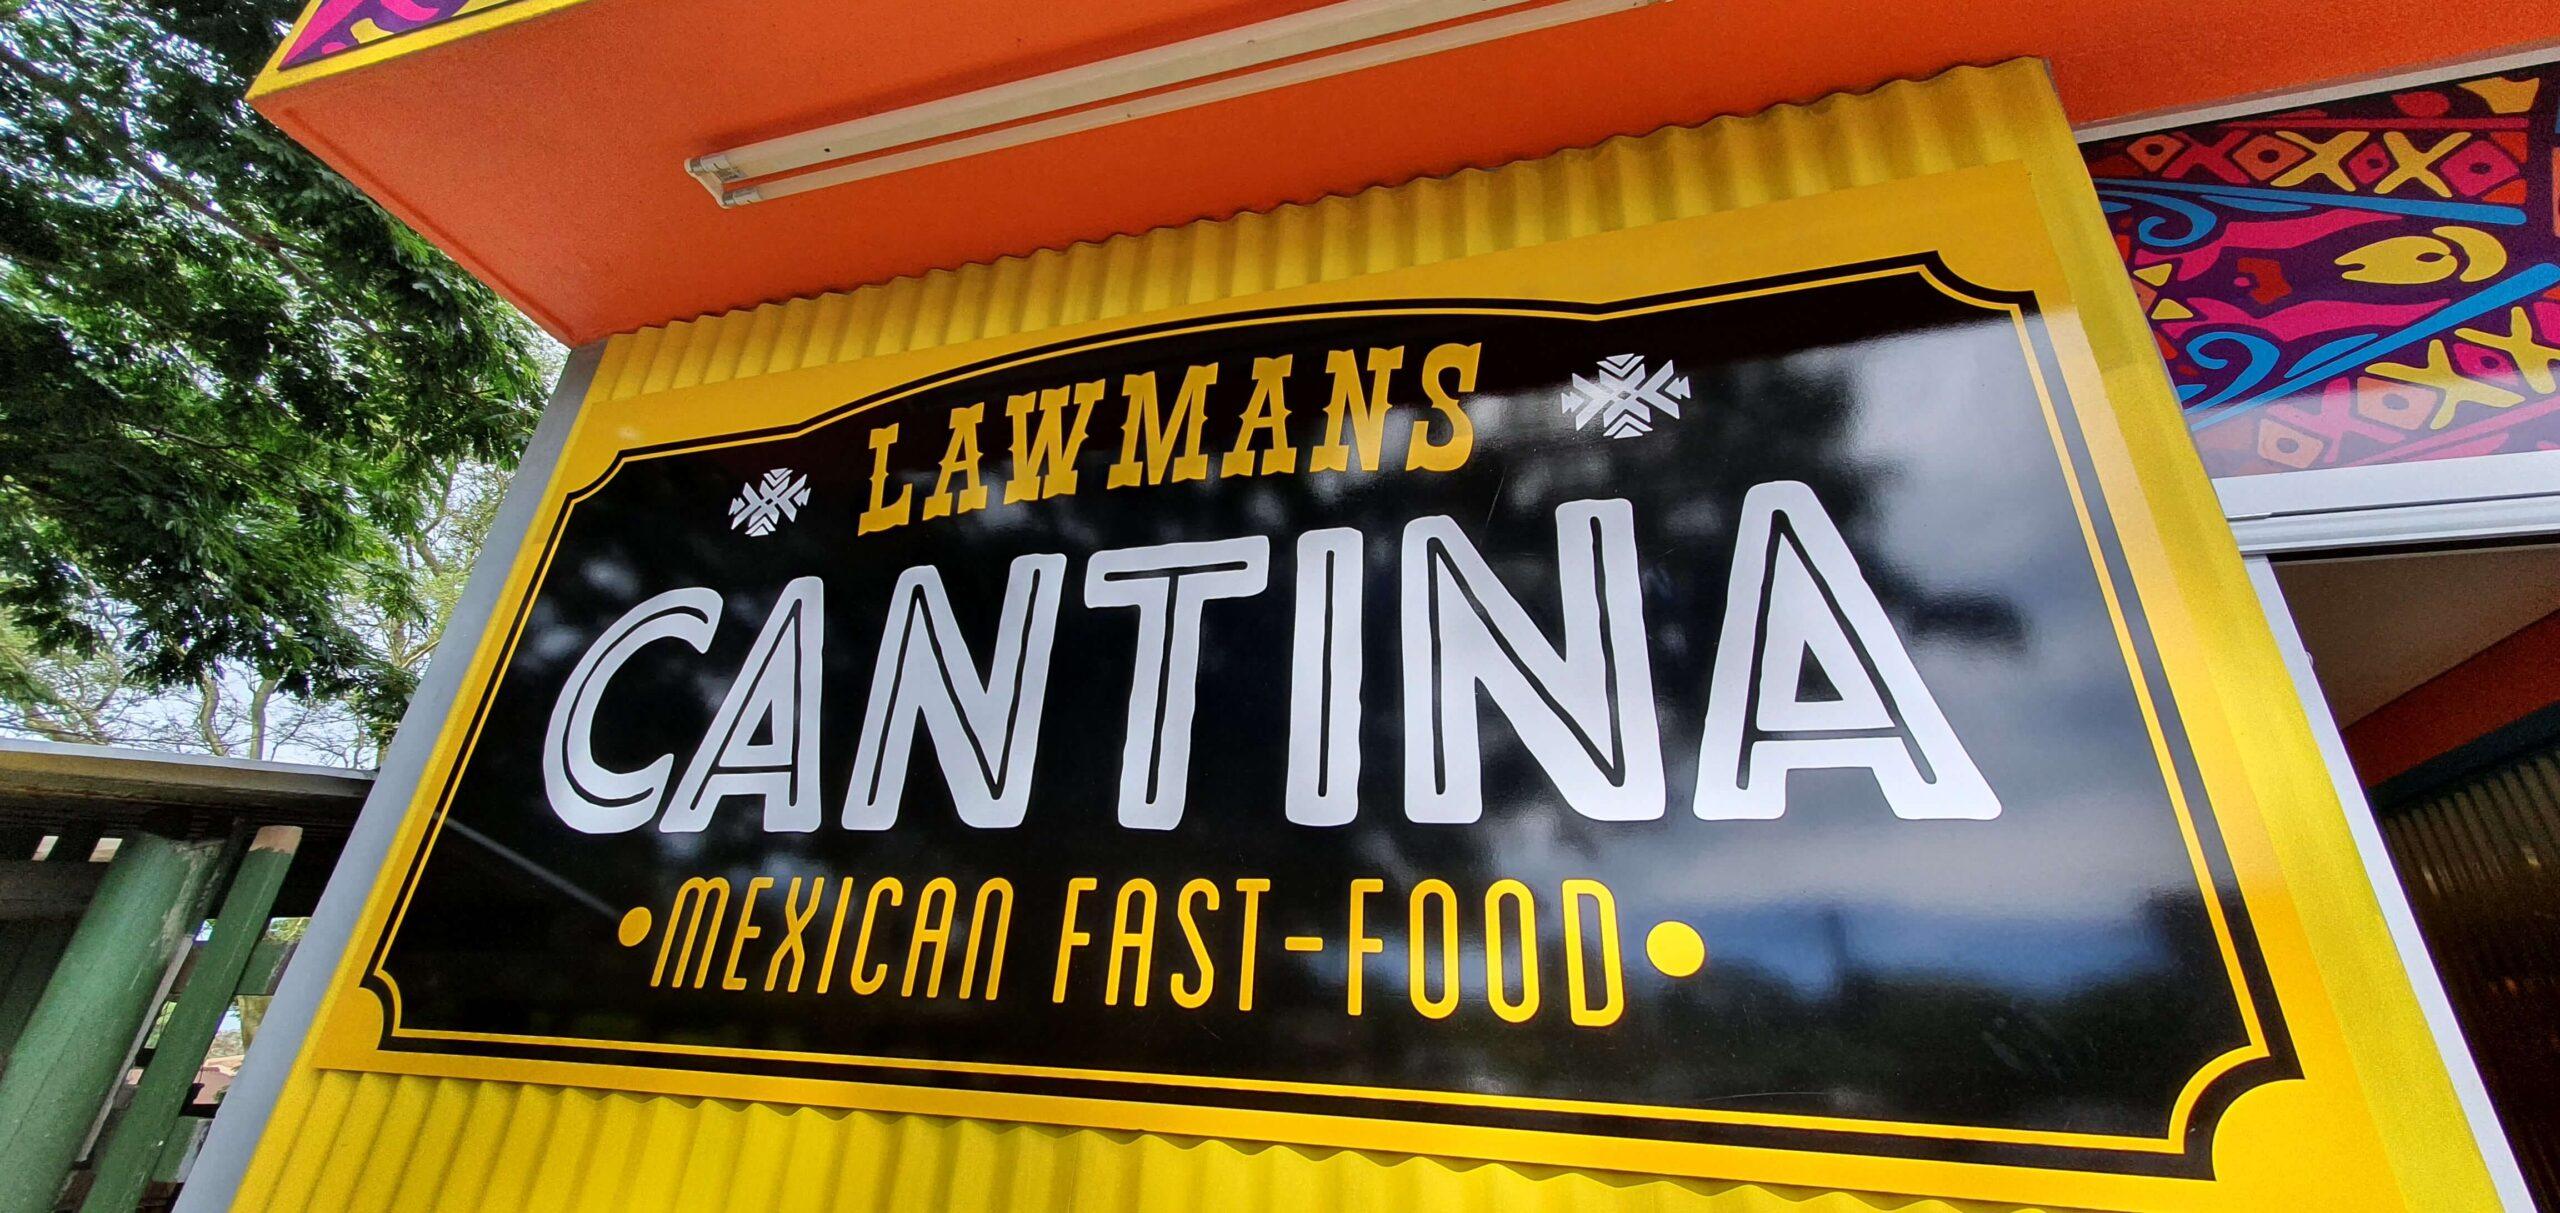 Lawmans Cantina Front